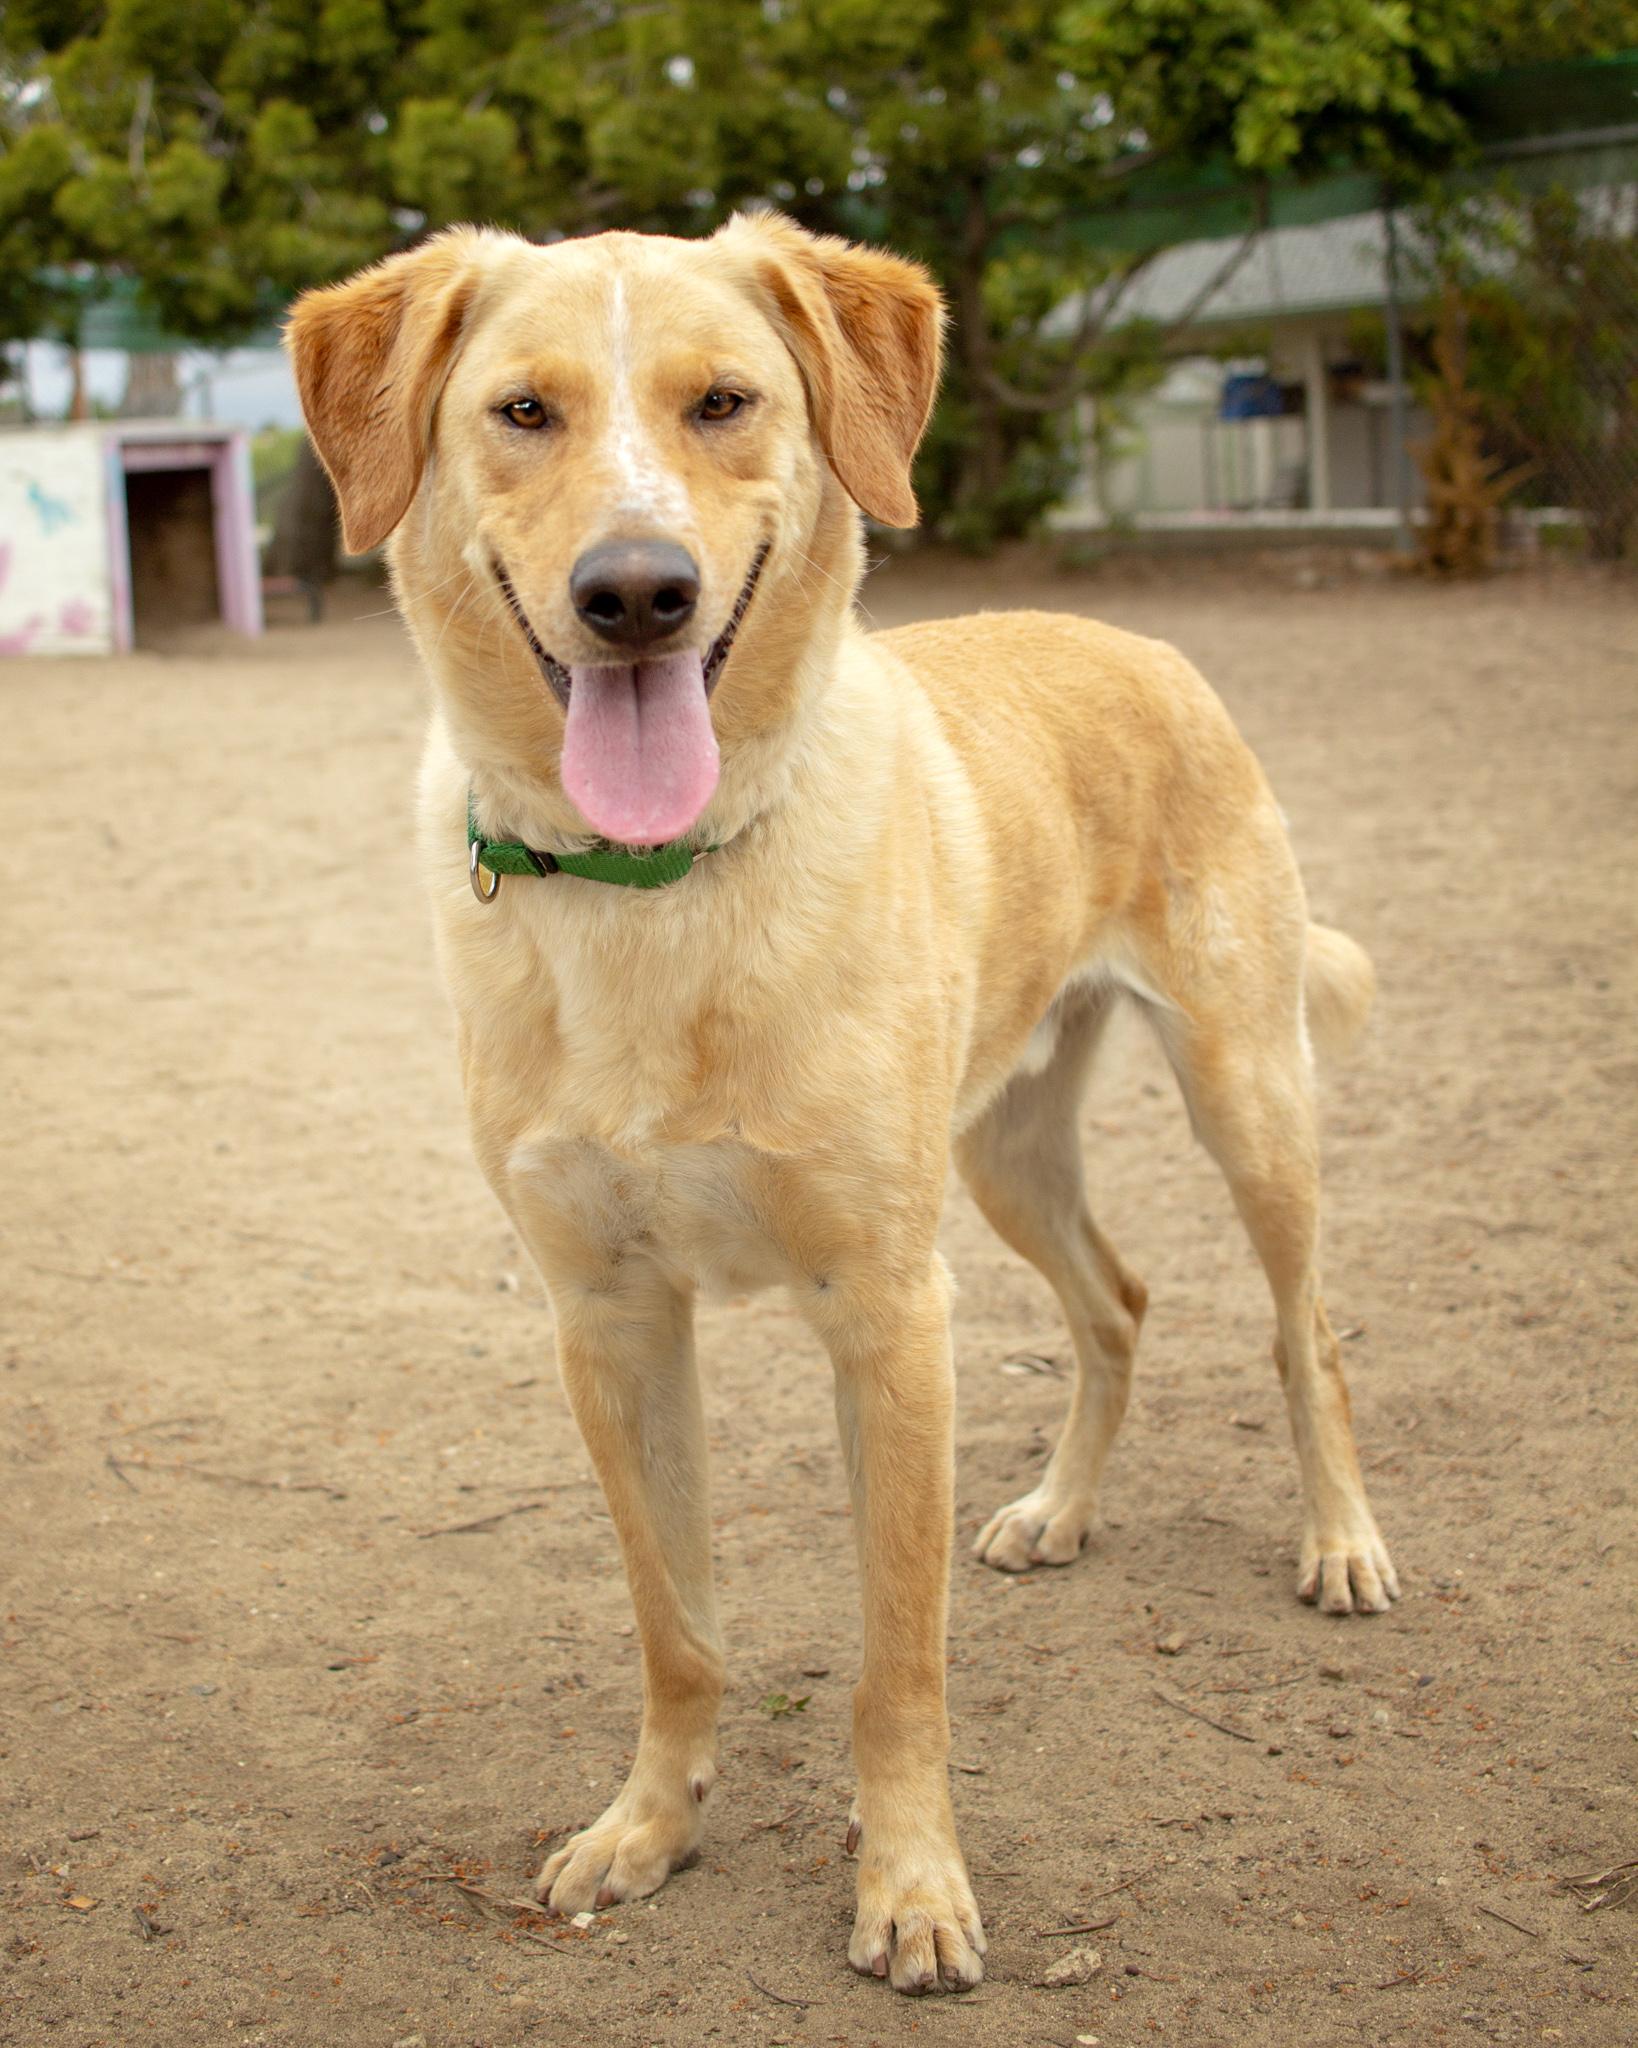 395-Orange-County-Dog-Photography-Steamer-Lee-Southern-California-SBACC.JPG